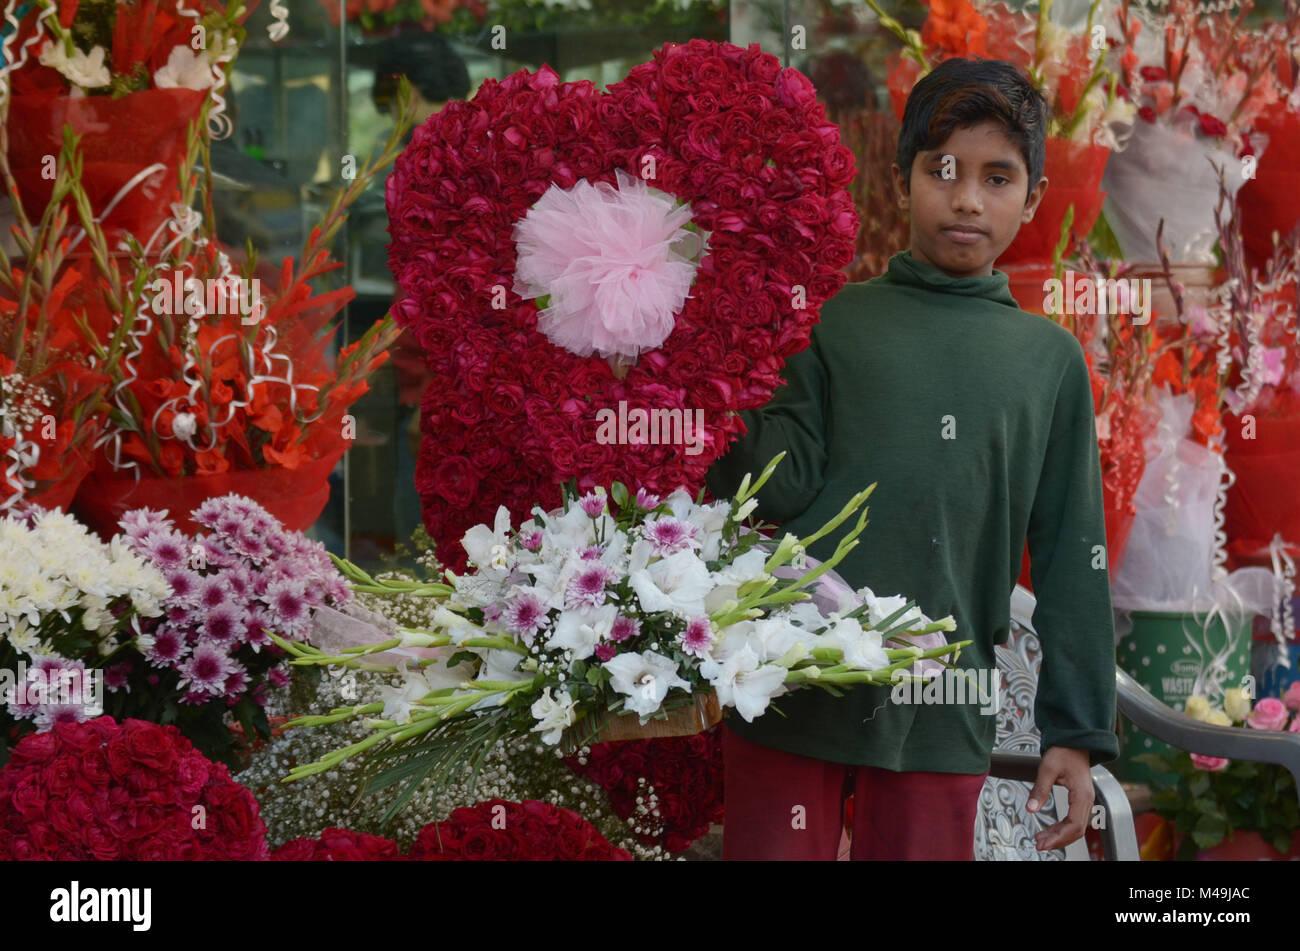 Pakistani people purchasing fresh roses flowers bouquets and pakistani people purchasing fresh roses flowers bouquets and garlands m49jacg izmirmasajfo Images